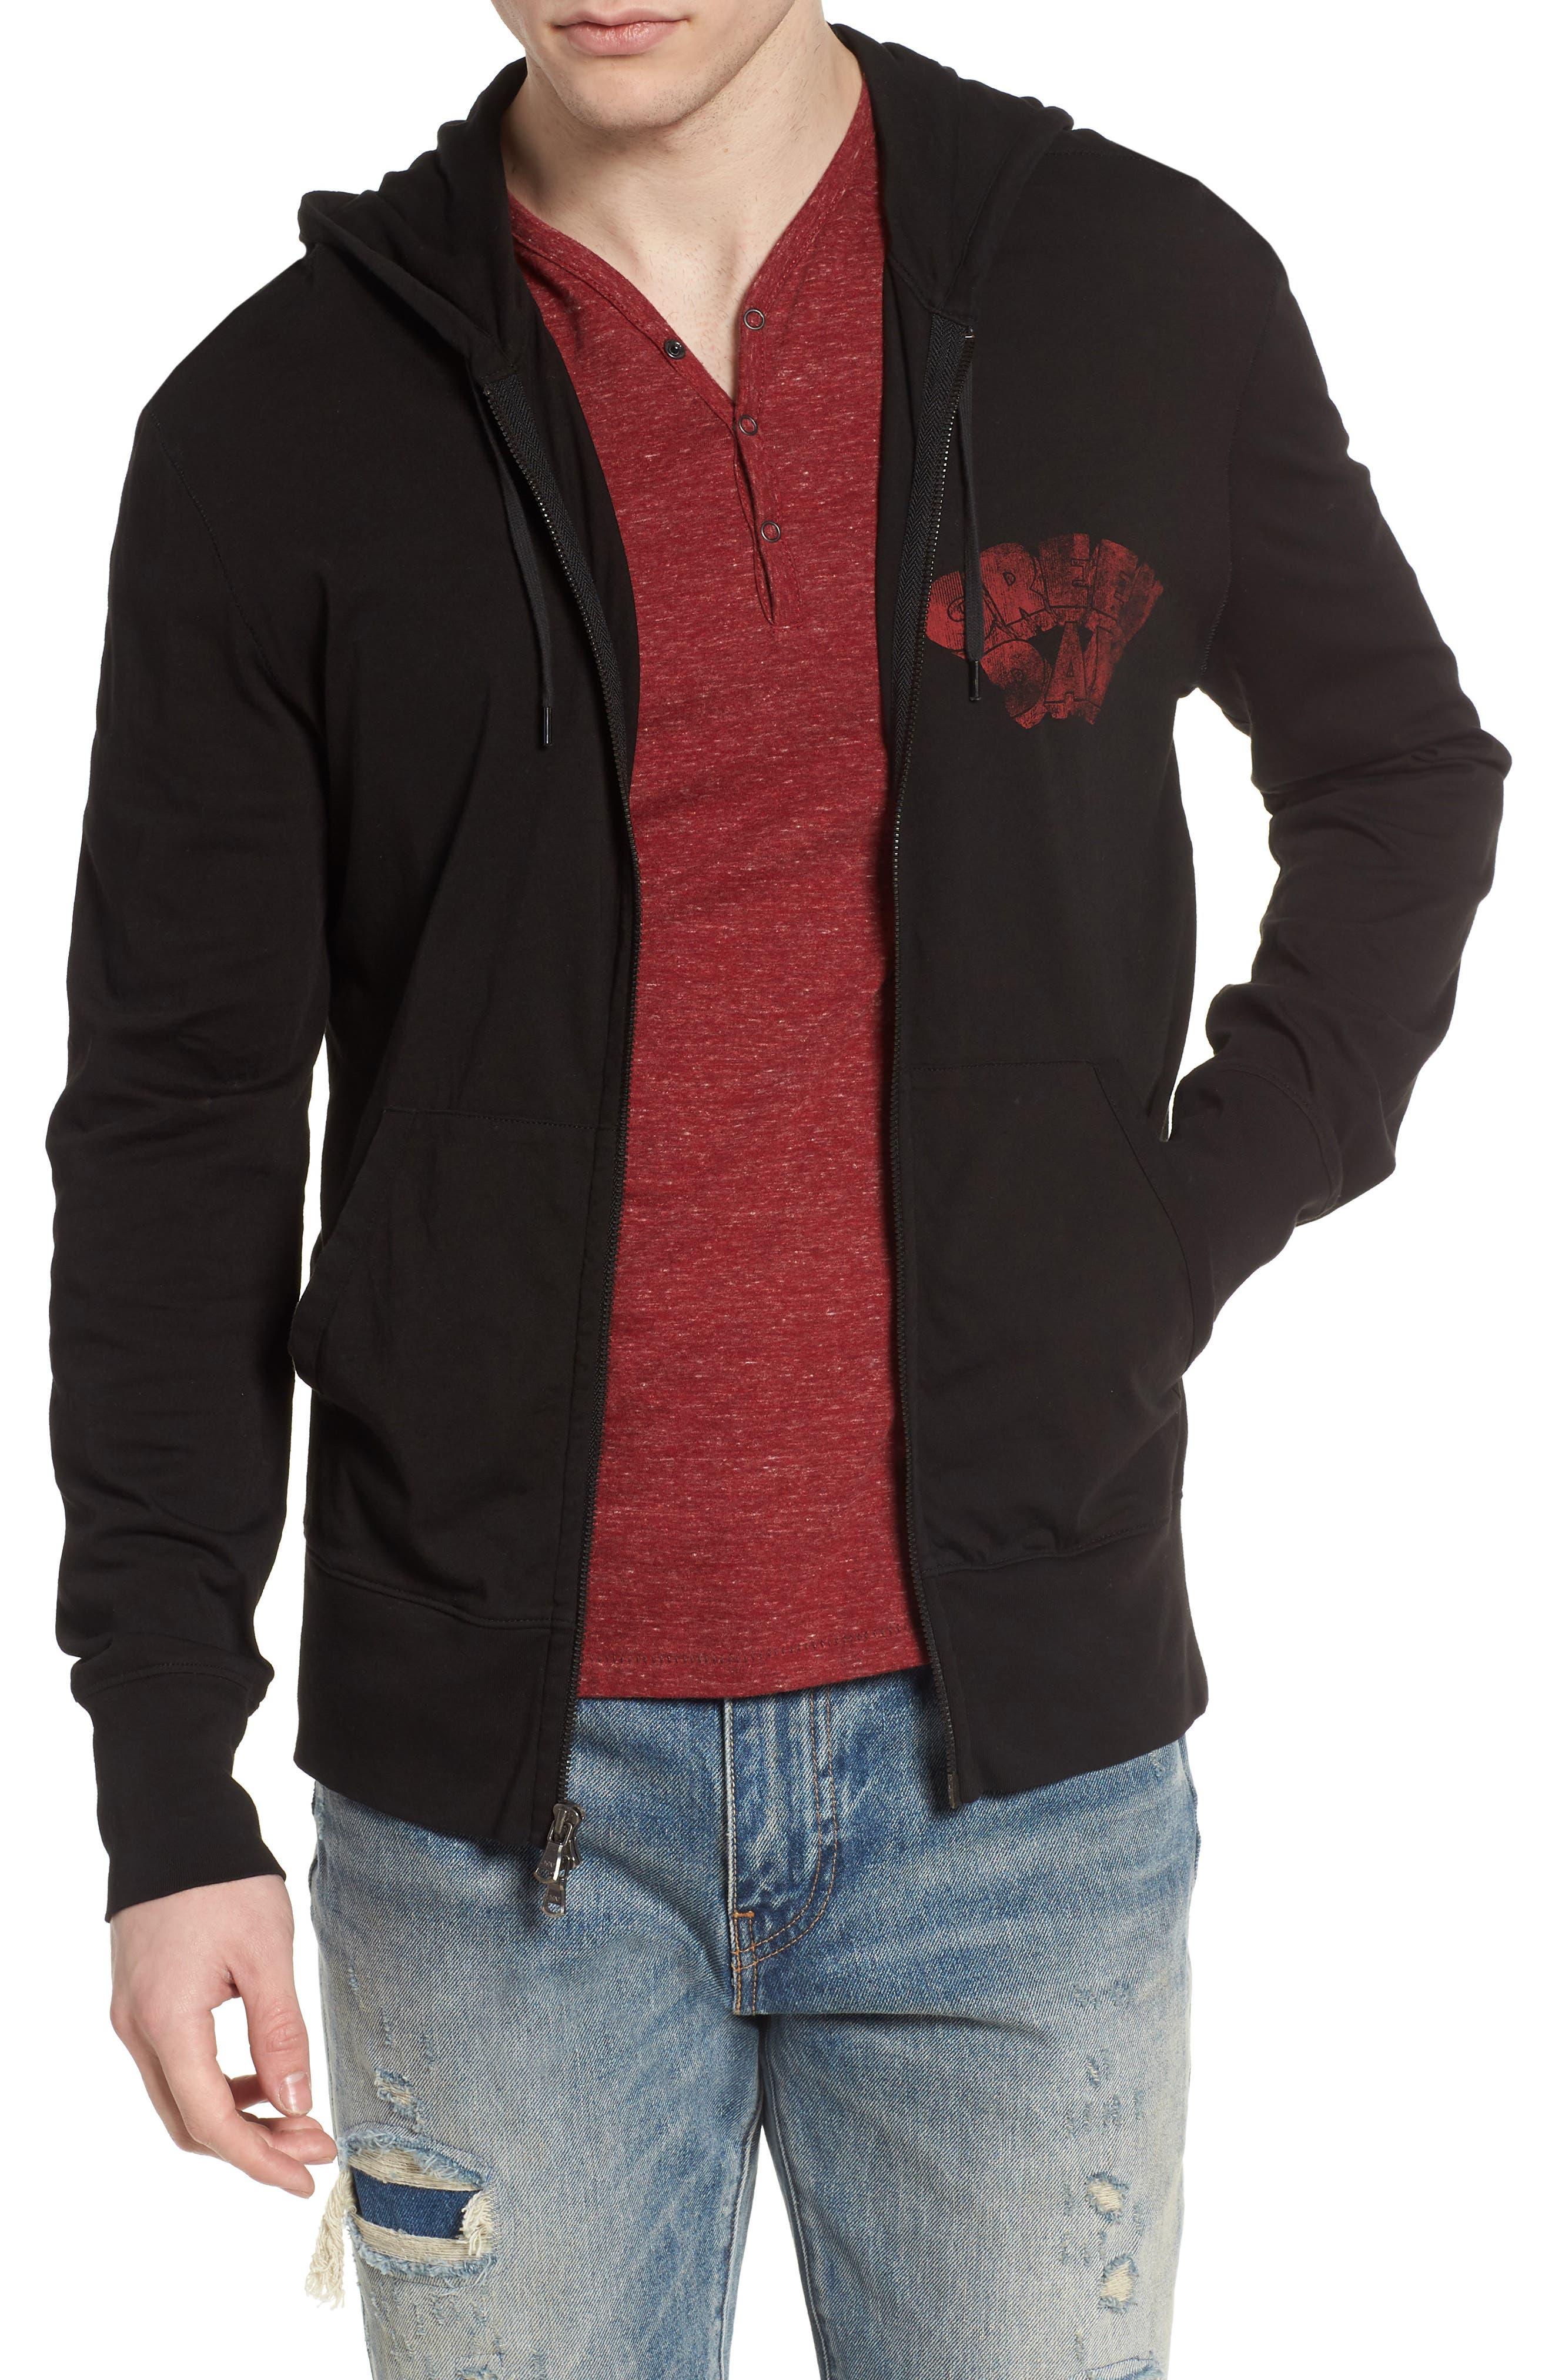 John Varvatos Green Day Regular Fit Full Zip Hoodie